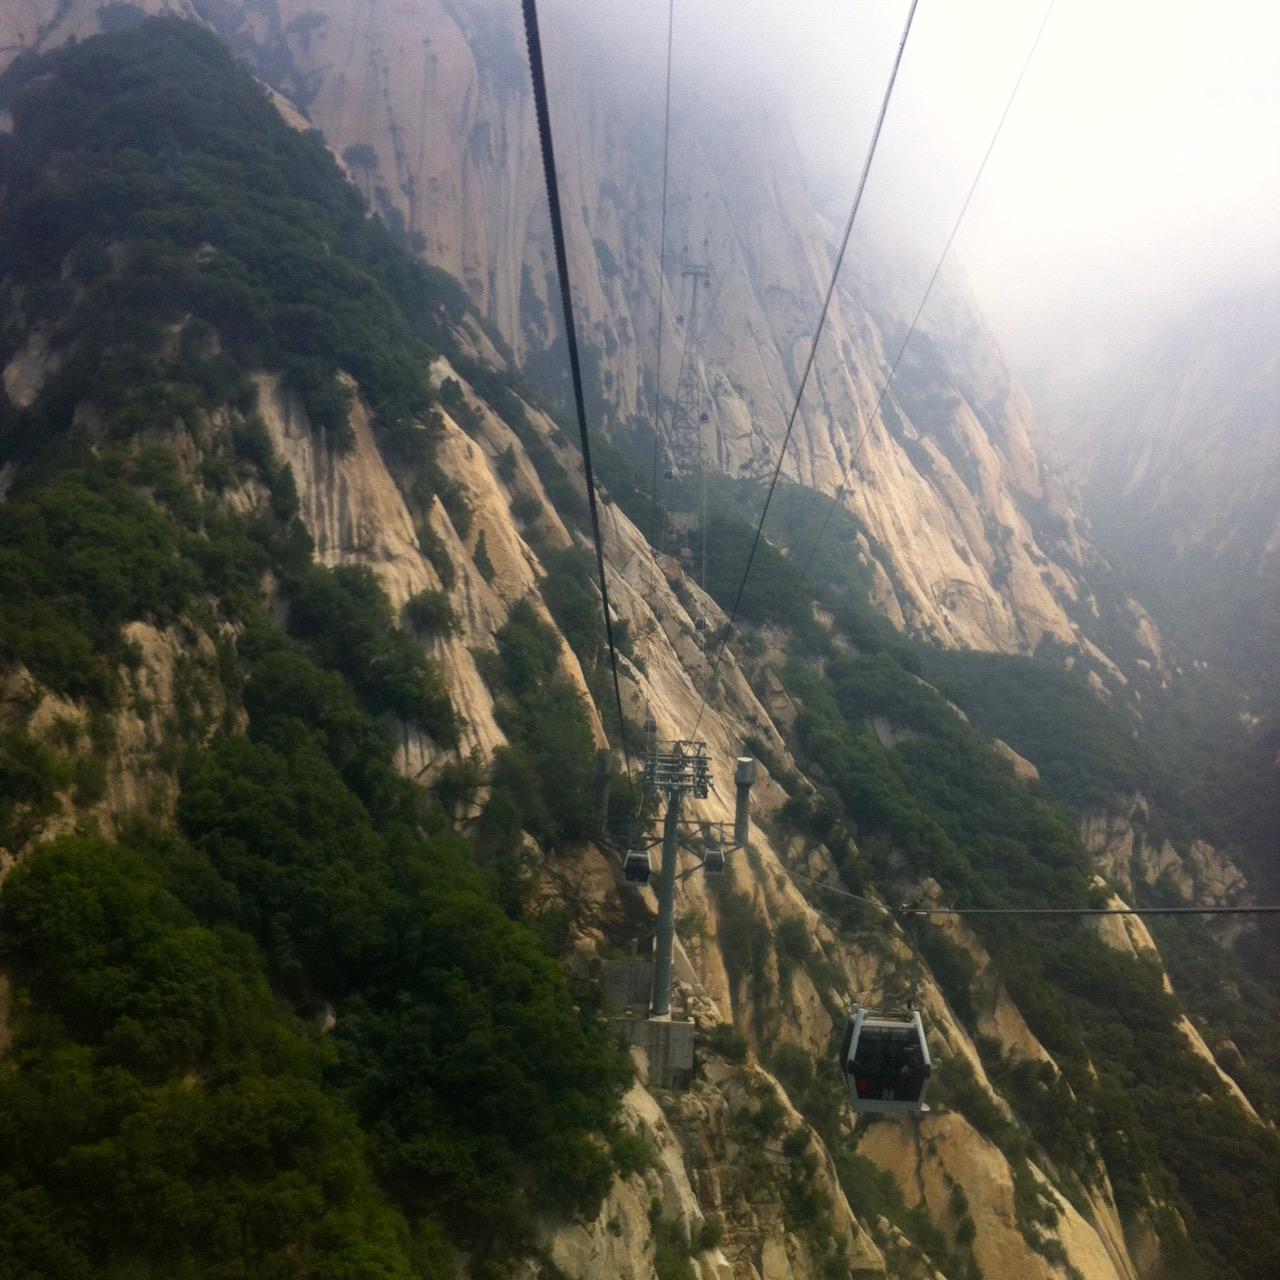 West Peak gondola